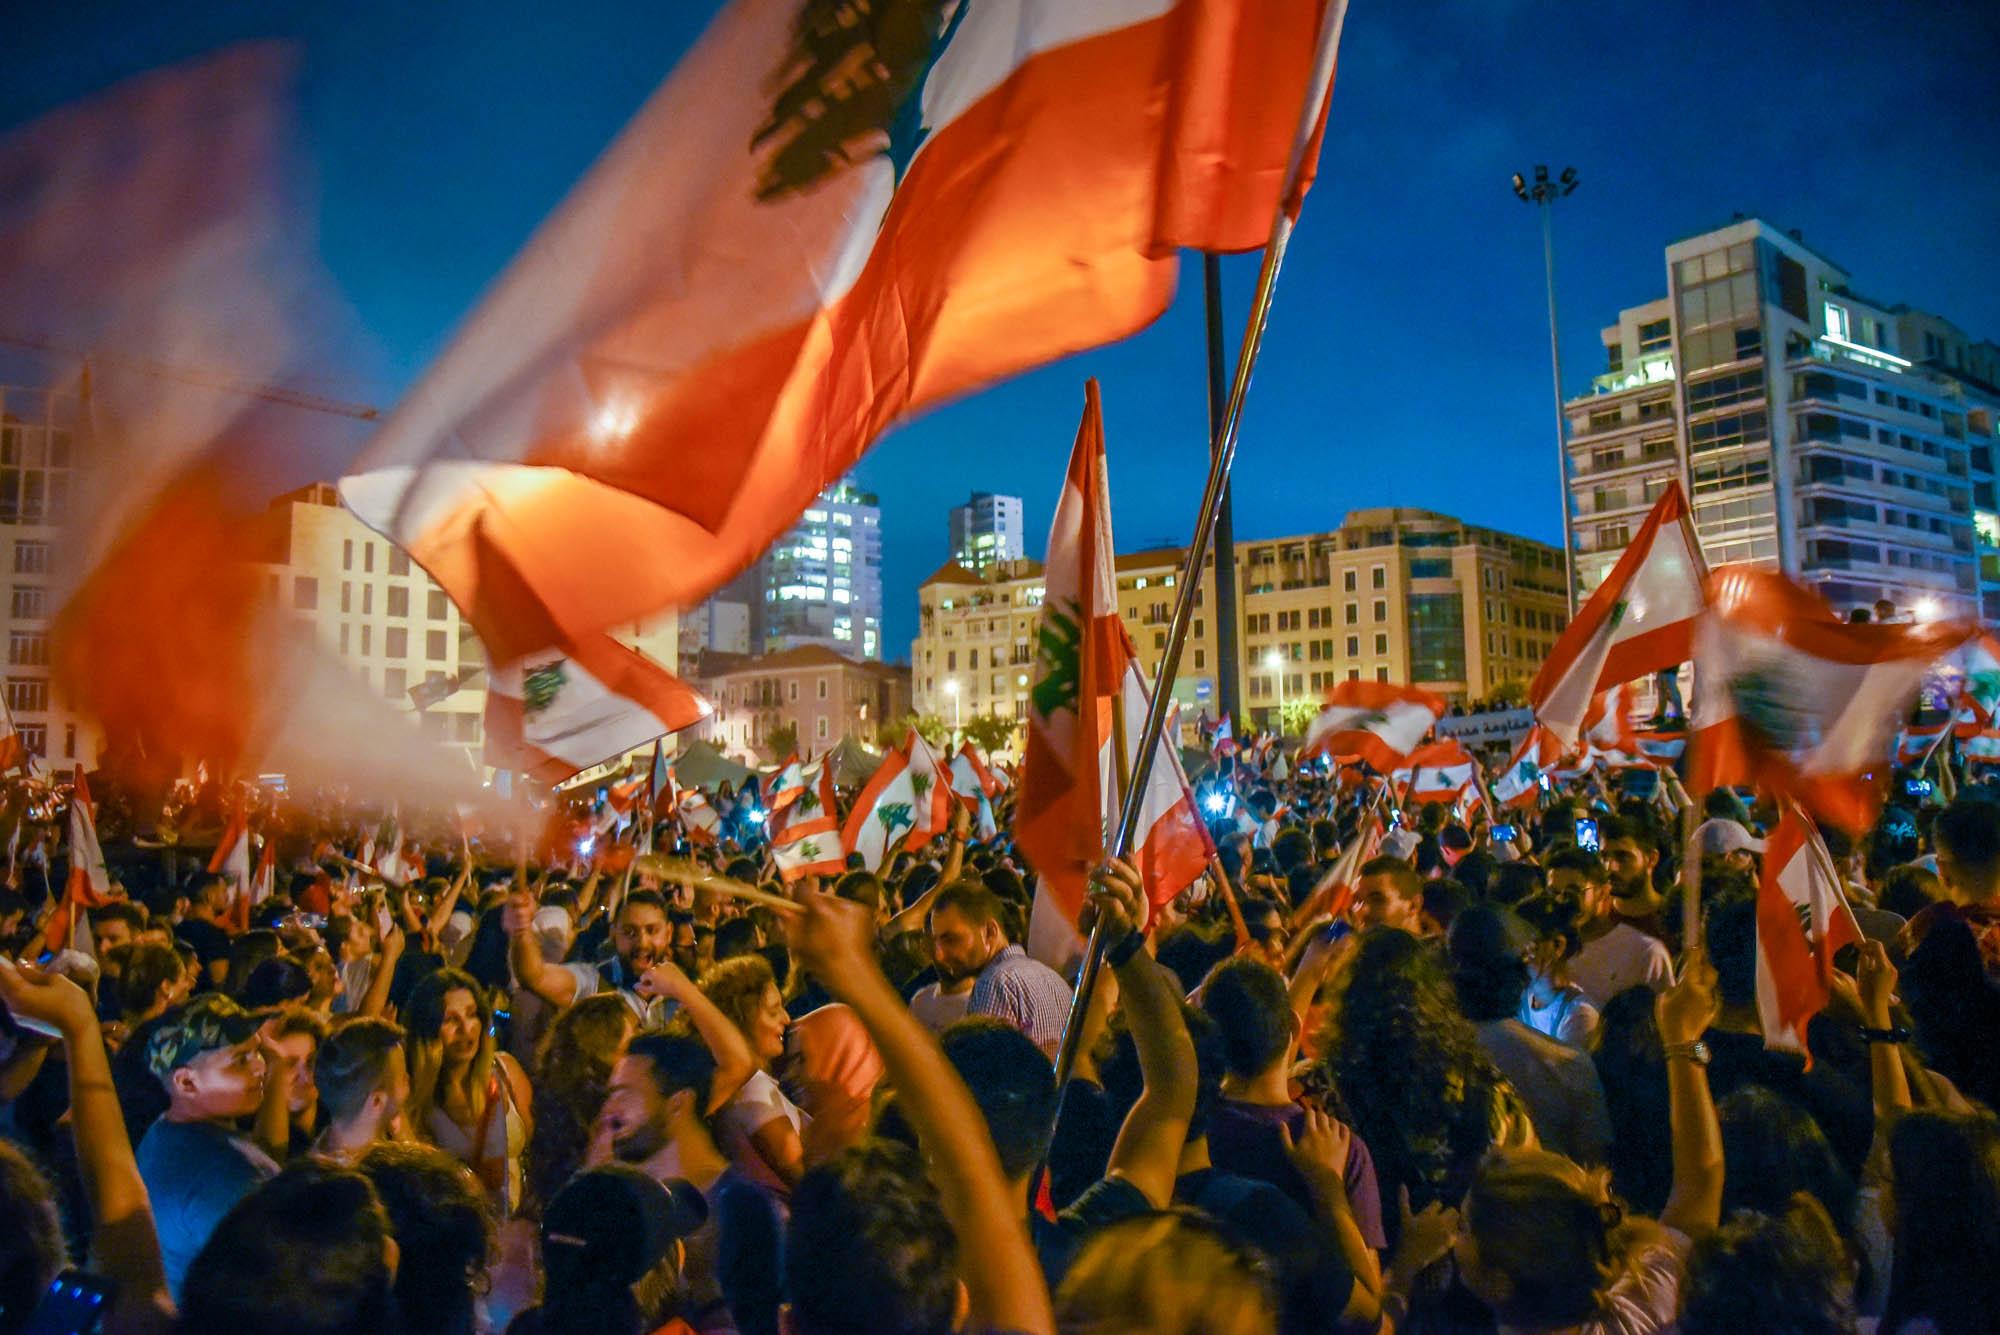 لحظات حاسمة امام لبنان